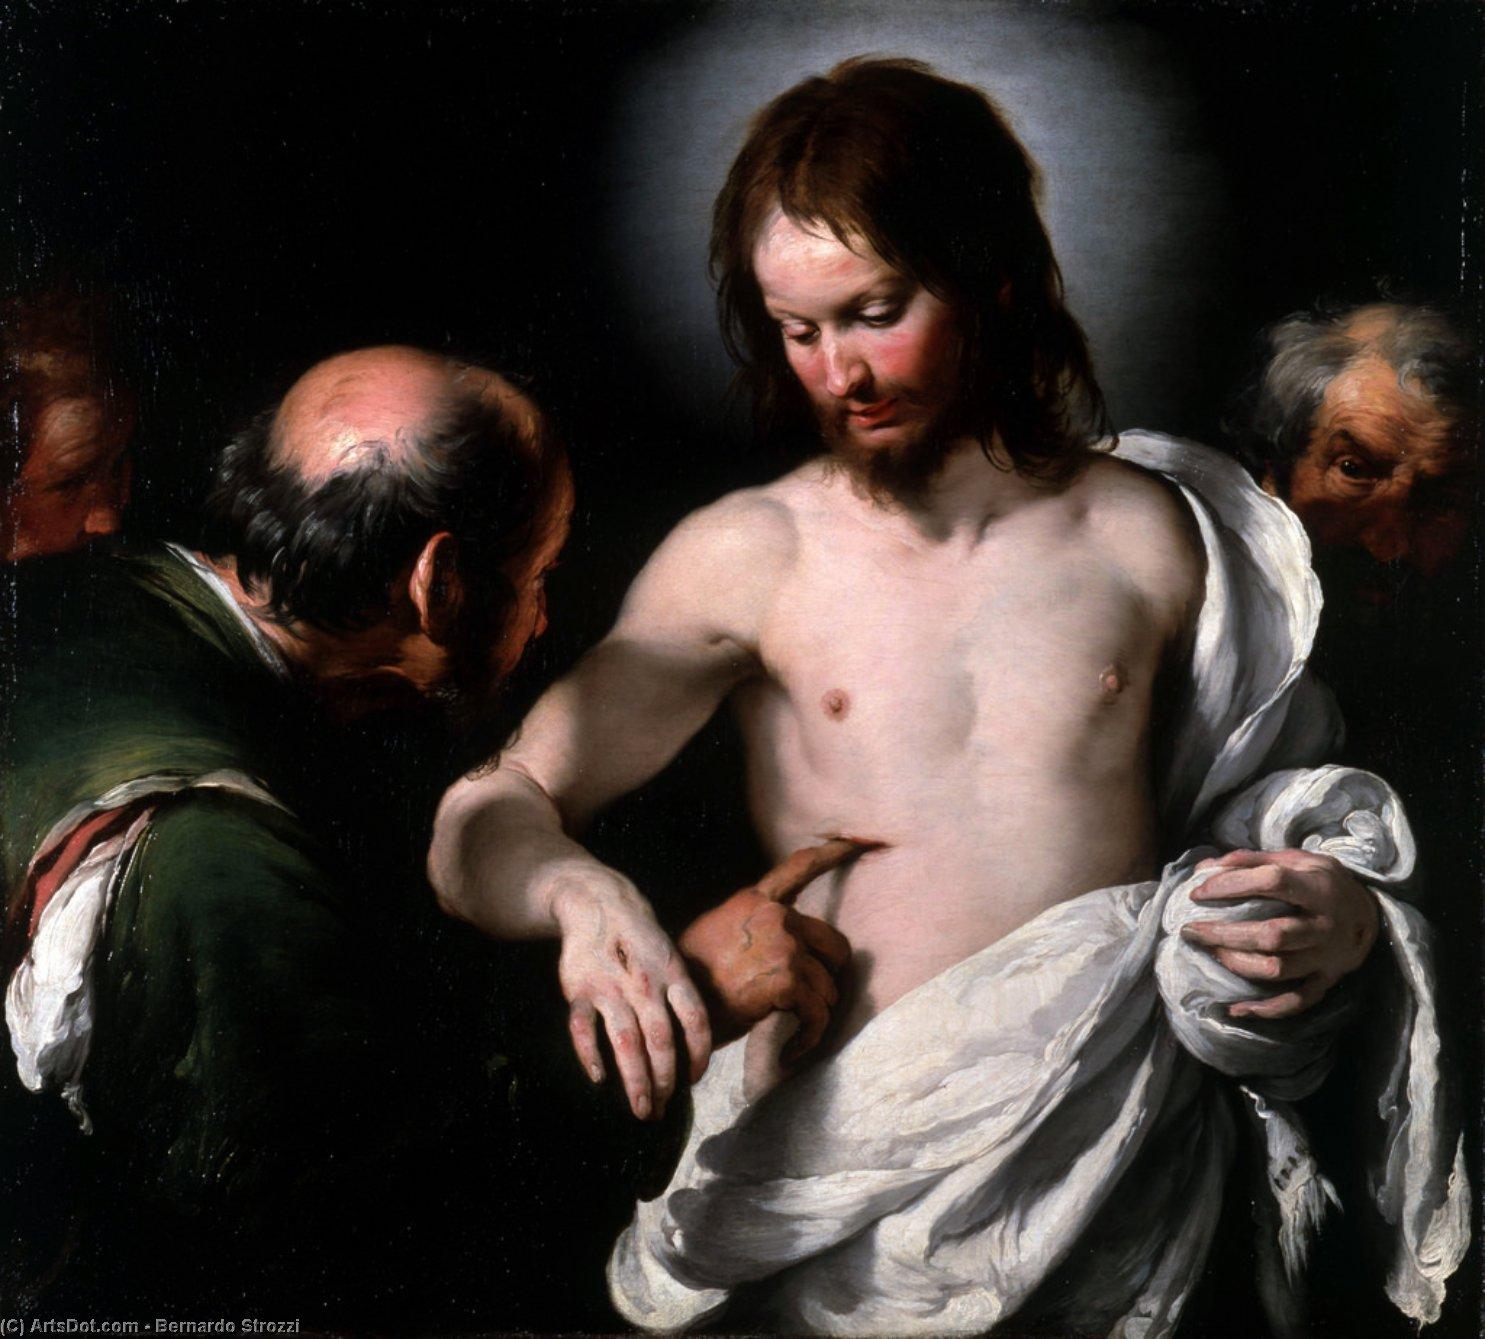 Wikioo.org - The Encyclopedia of Fine Arts - Painting, Artwork by Bernardo Strozzi - The Incredulity of Saint Thomas